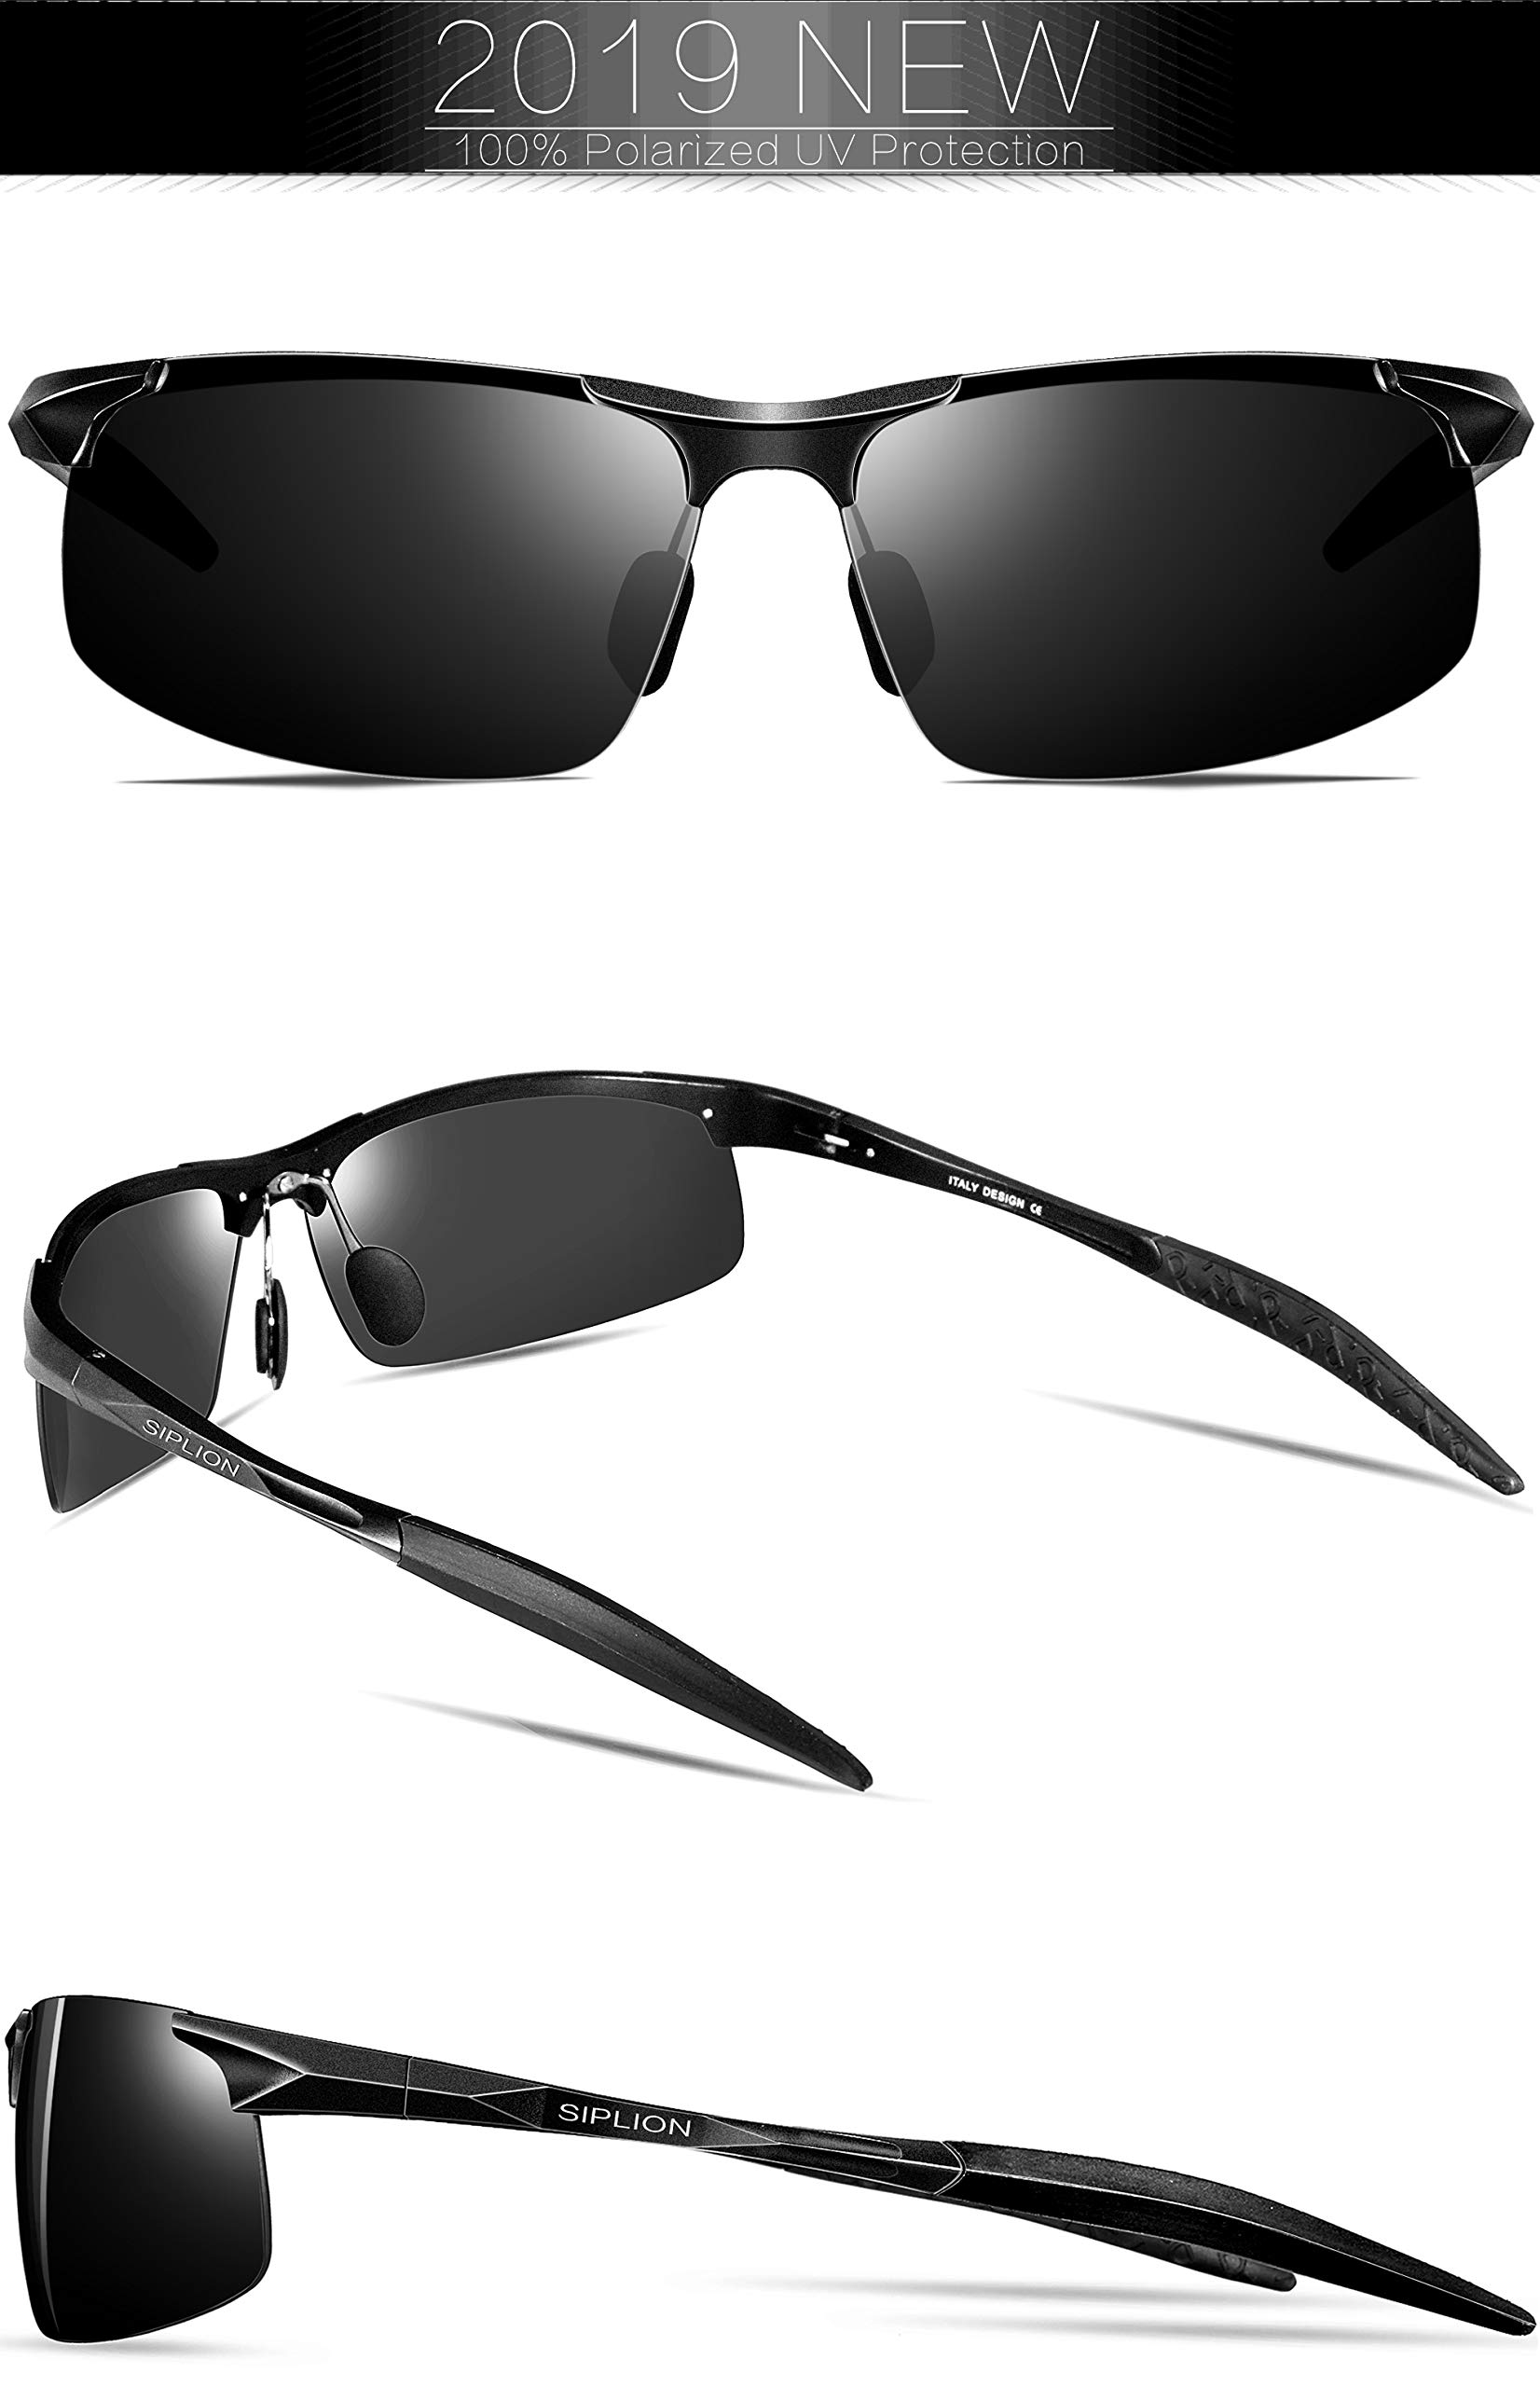 7e9f1ede8f SIPLION Men s Driving Polarized Sport Sunglasses Al-Mg Metal Frame ...